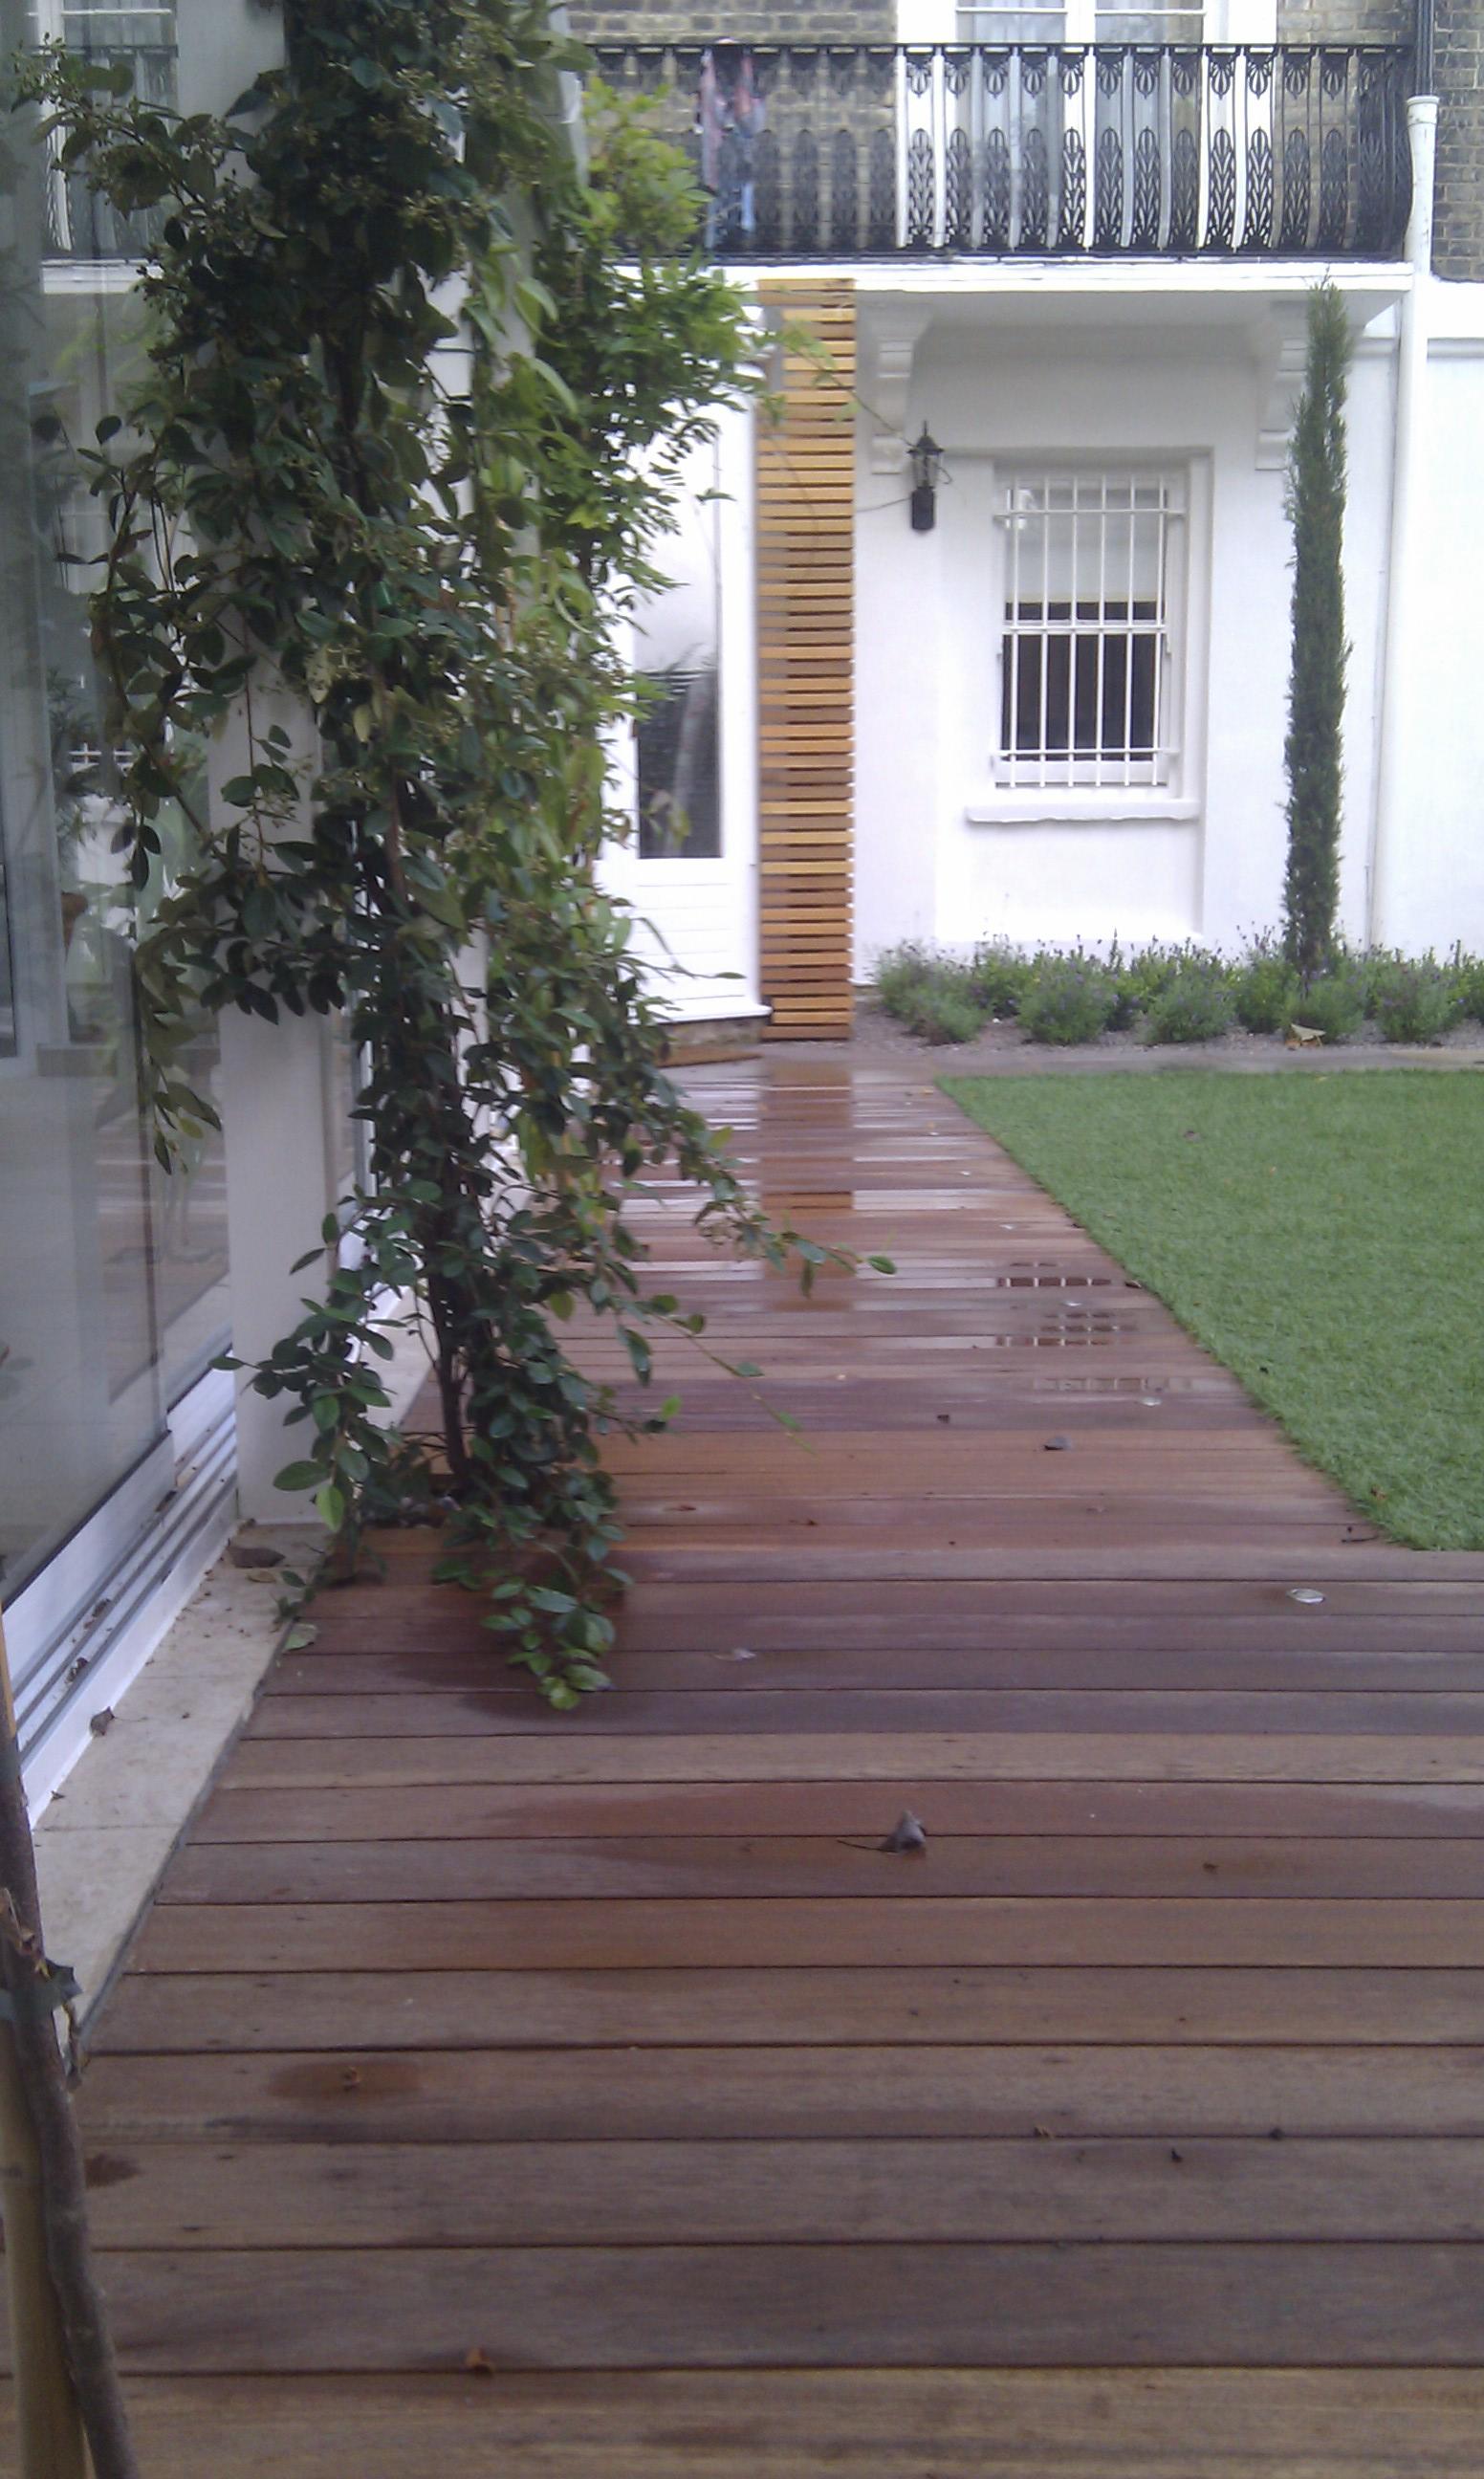 modern garden design london slatted grey privacy screen sandstone paving easy grass balau hardwood decking (34)